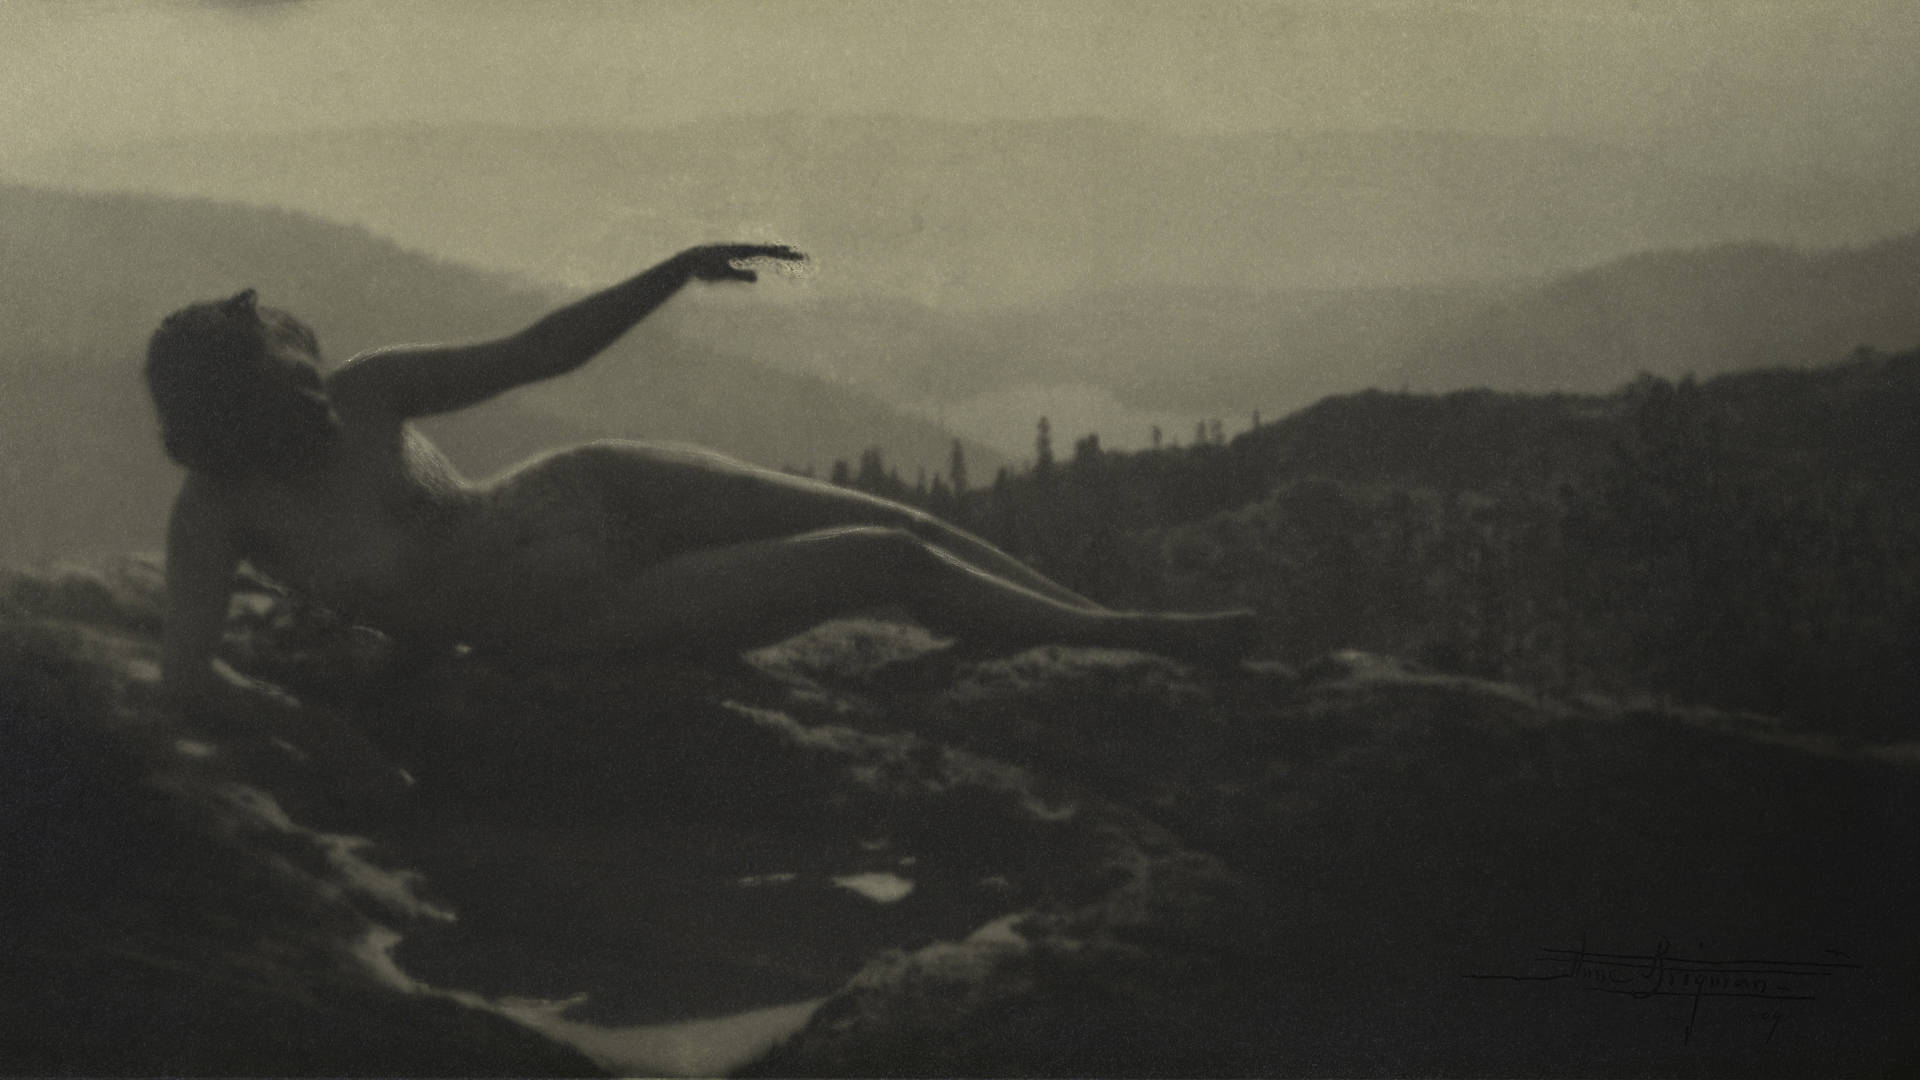 Anne Brigman, 'Dawn,' 1909. © The Metropolitan Museum of Art. Image source: Art Resource, NY